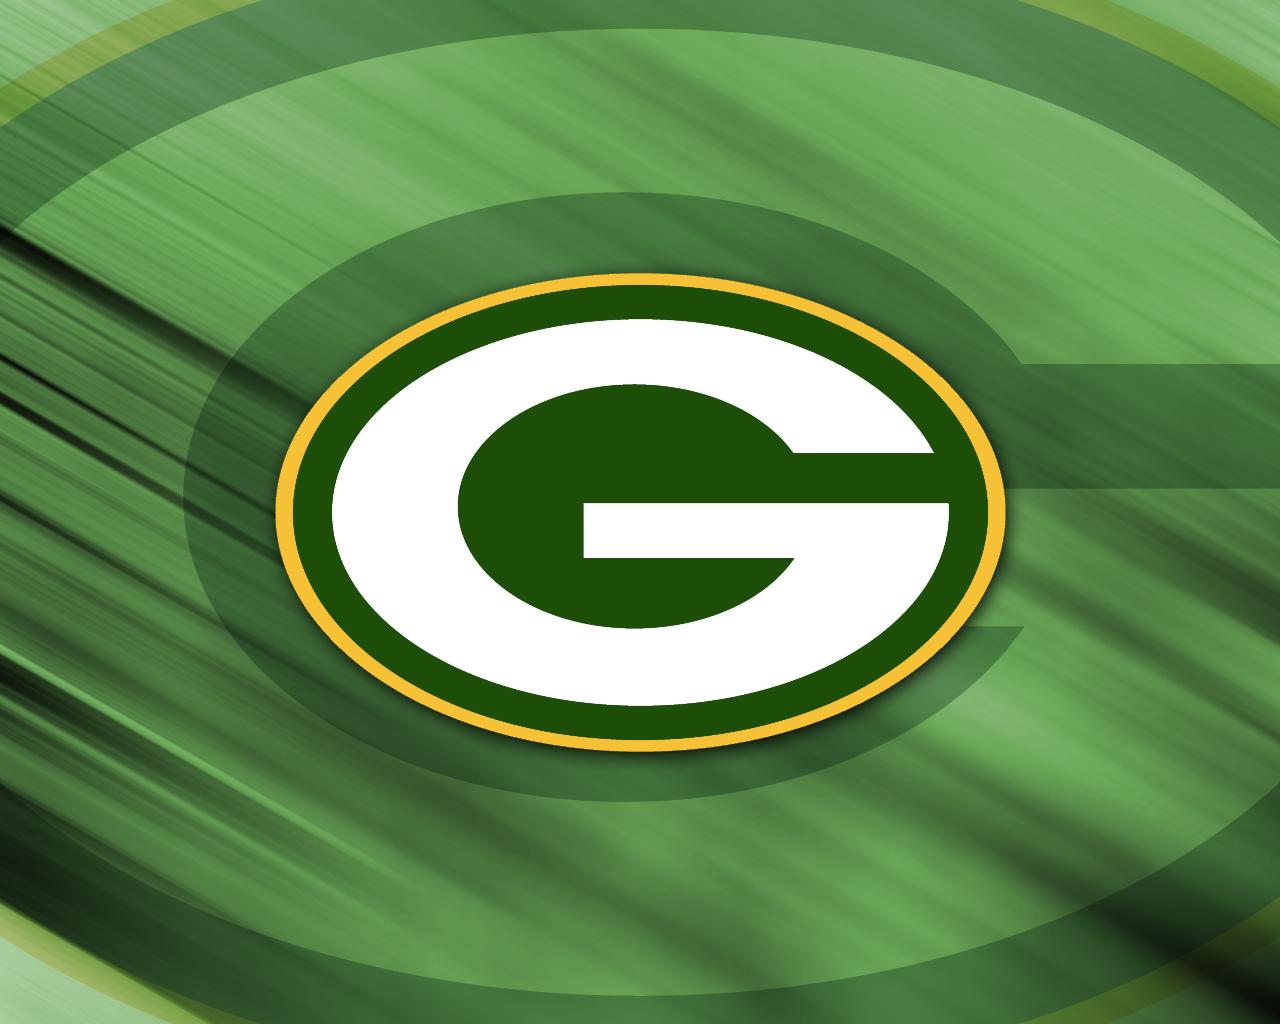 History of All Logos: All Green Bay Packers Logos